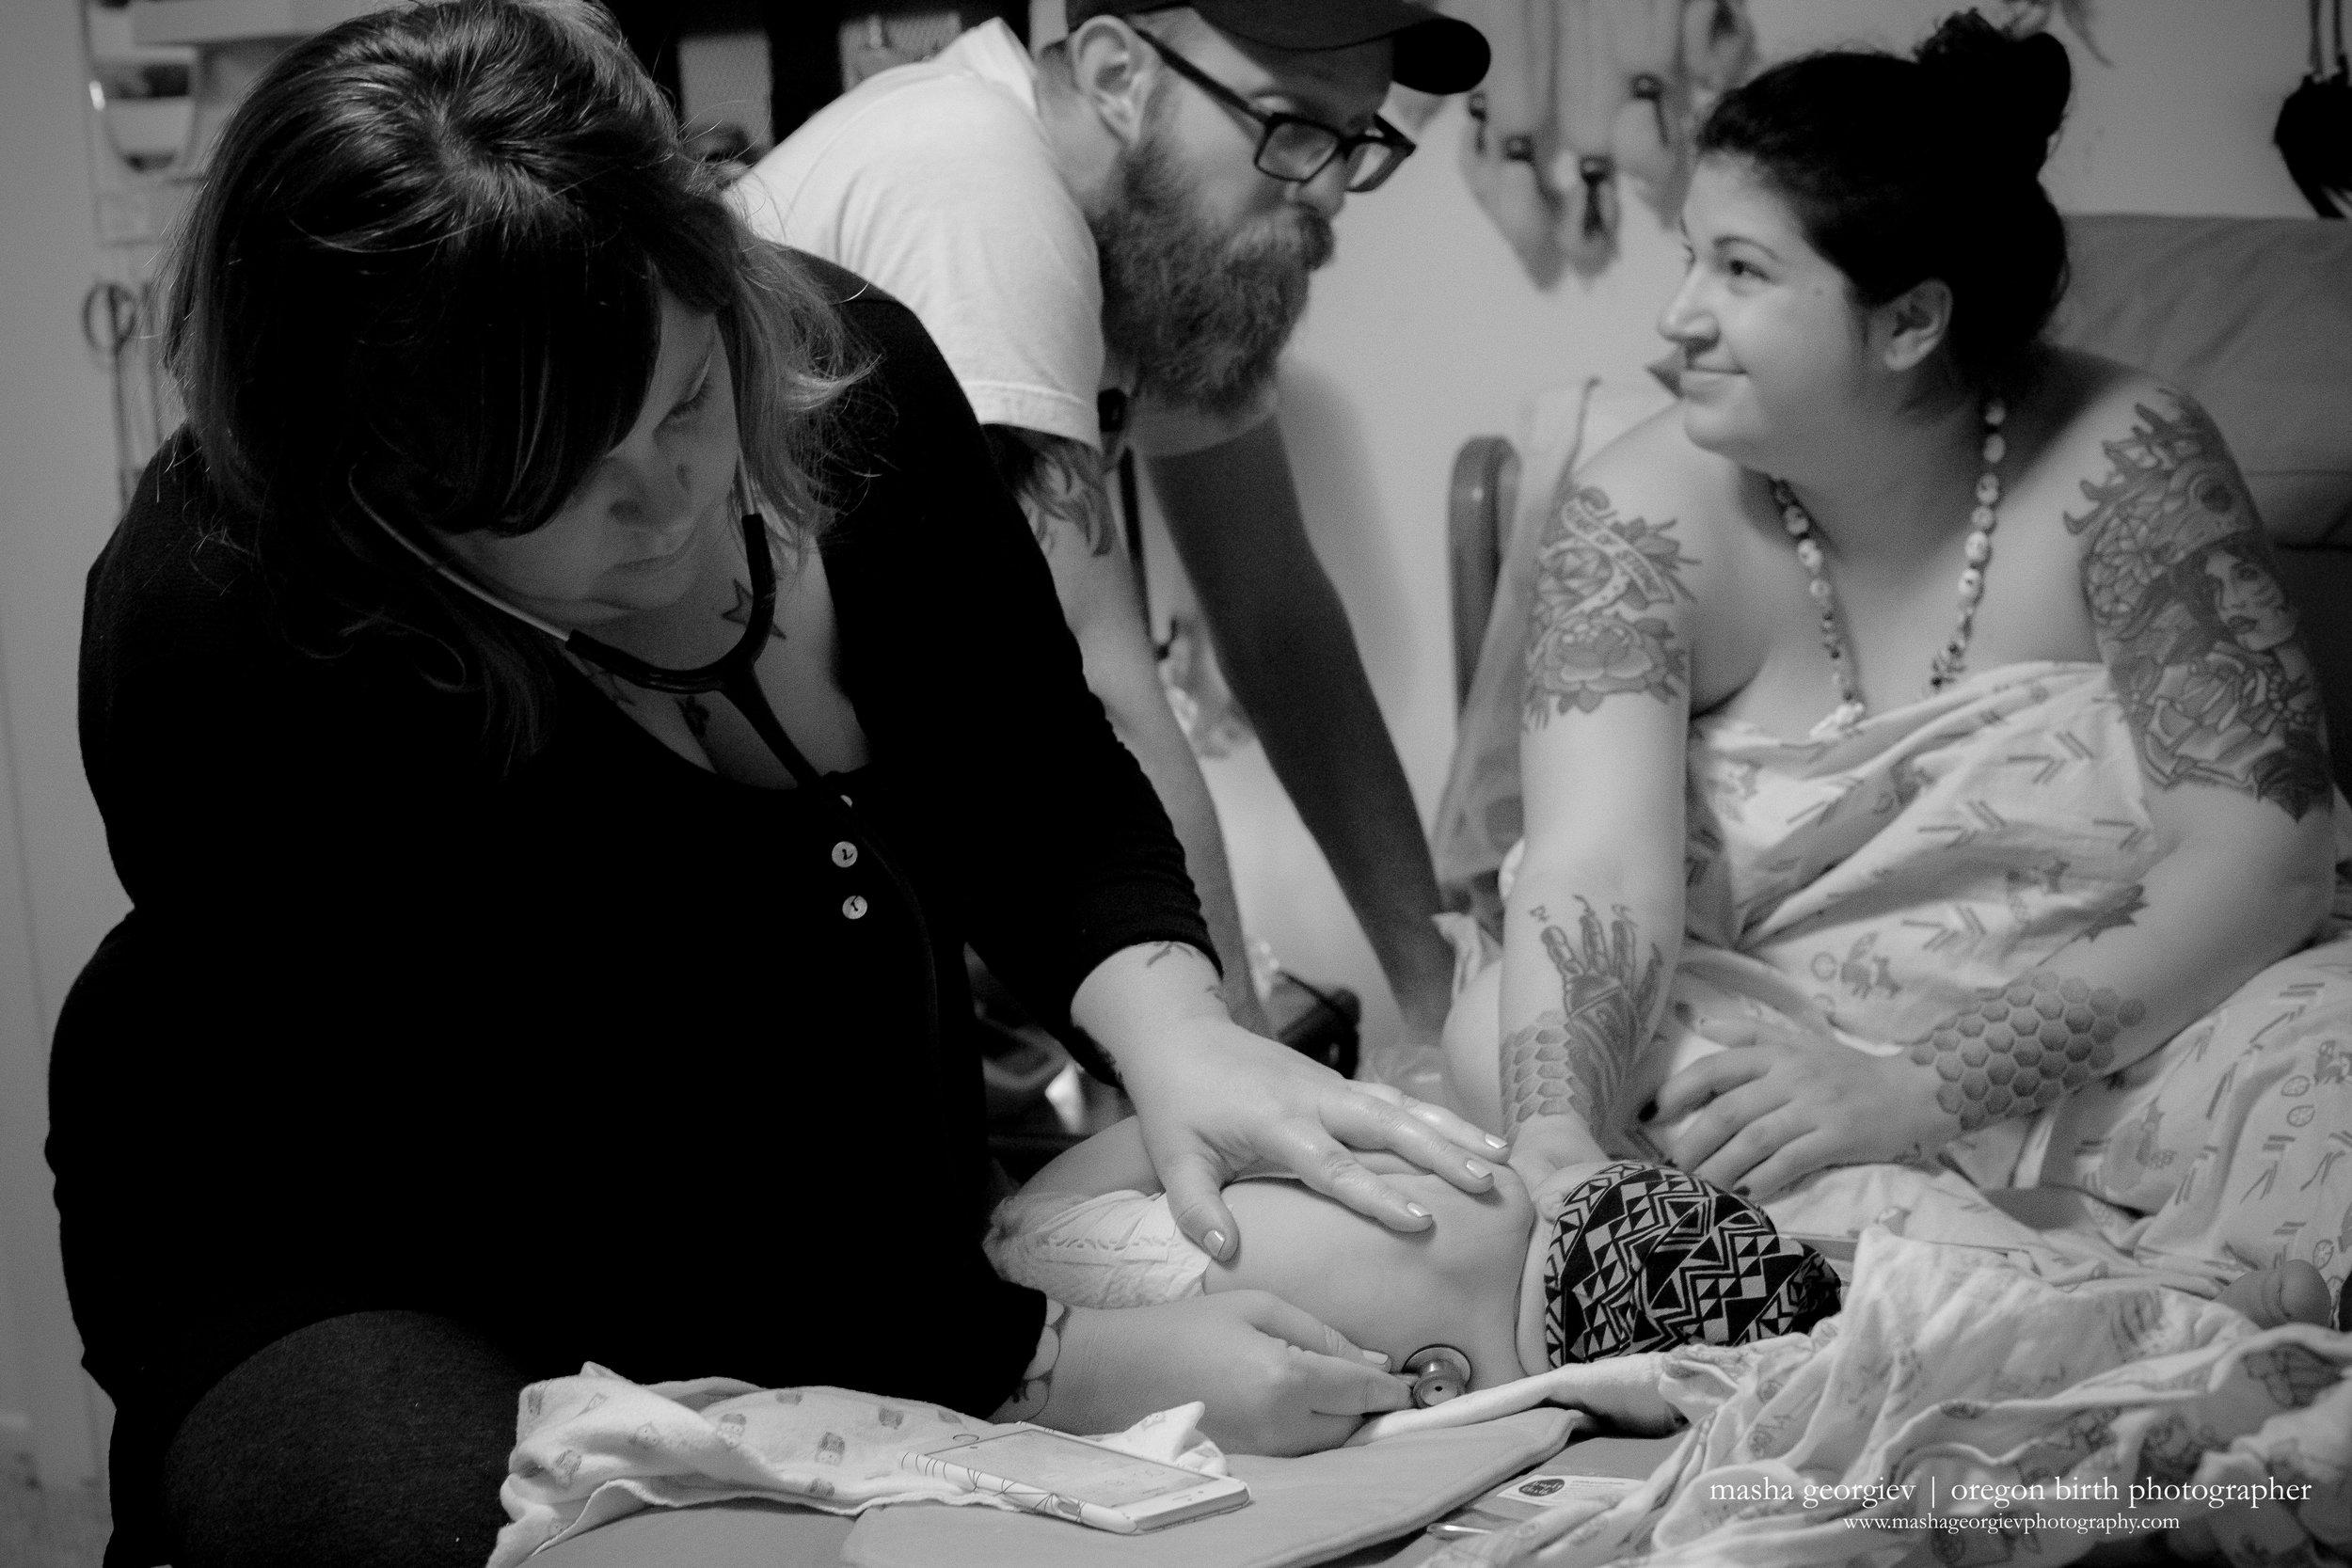 Oregon-Birth-Photographer-110.jpg